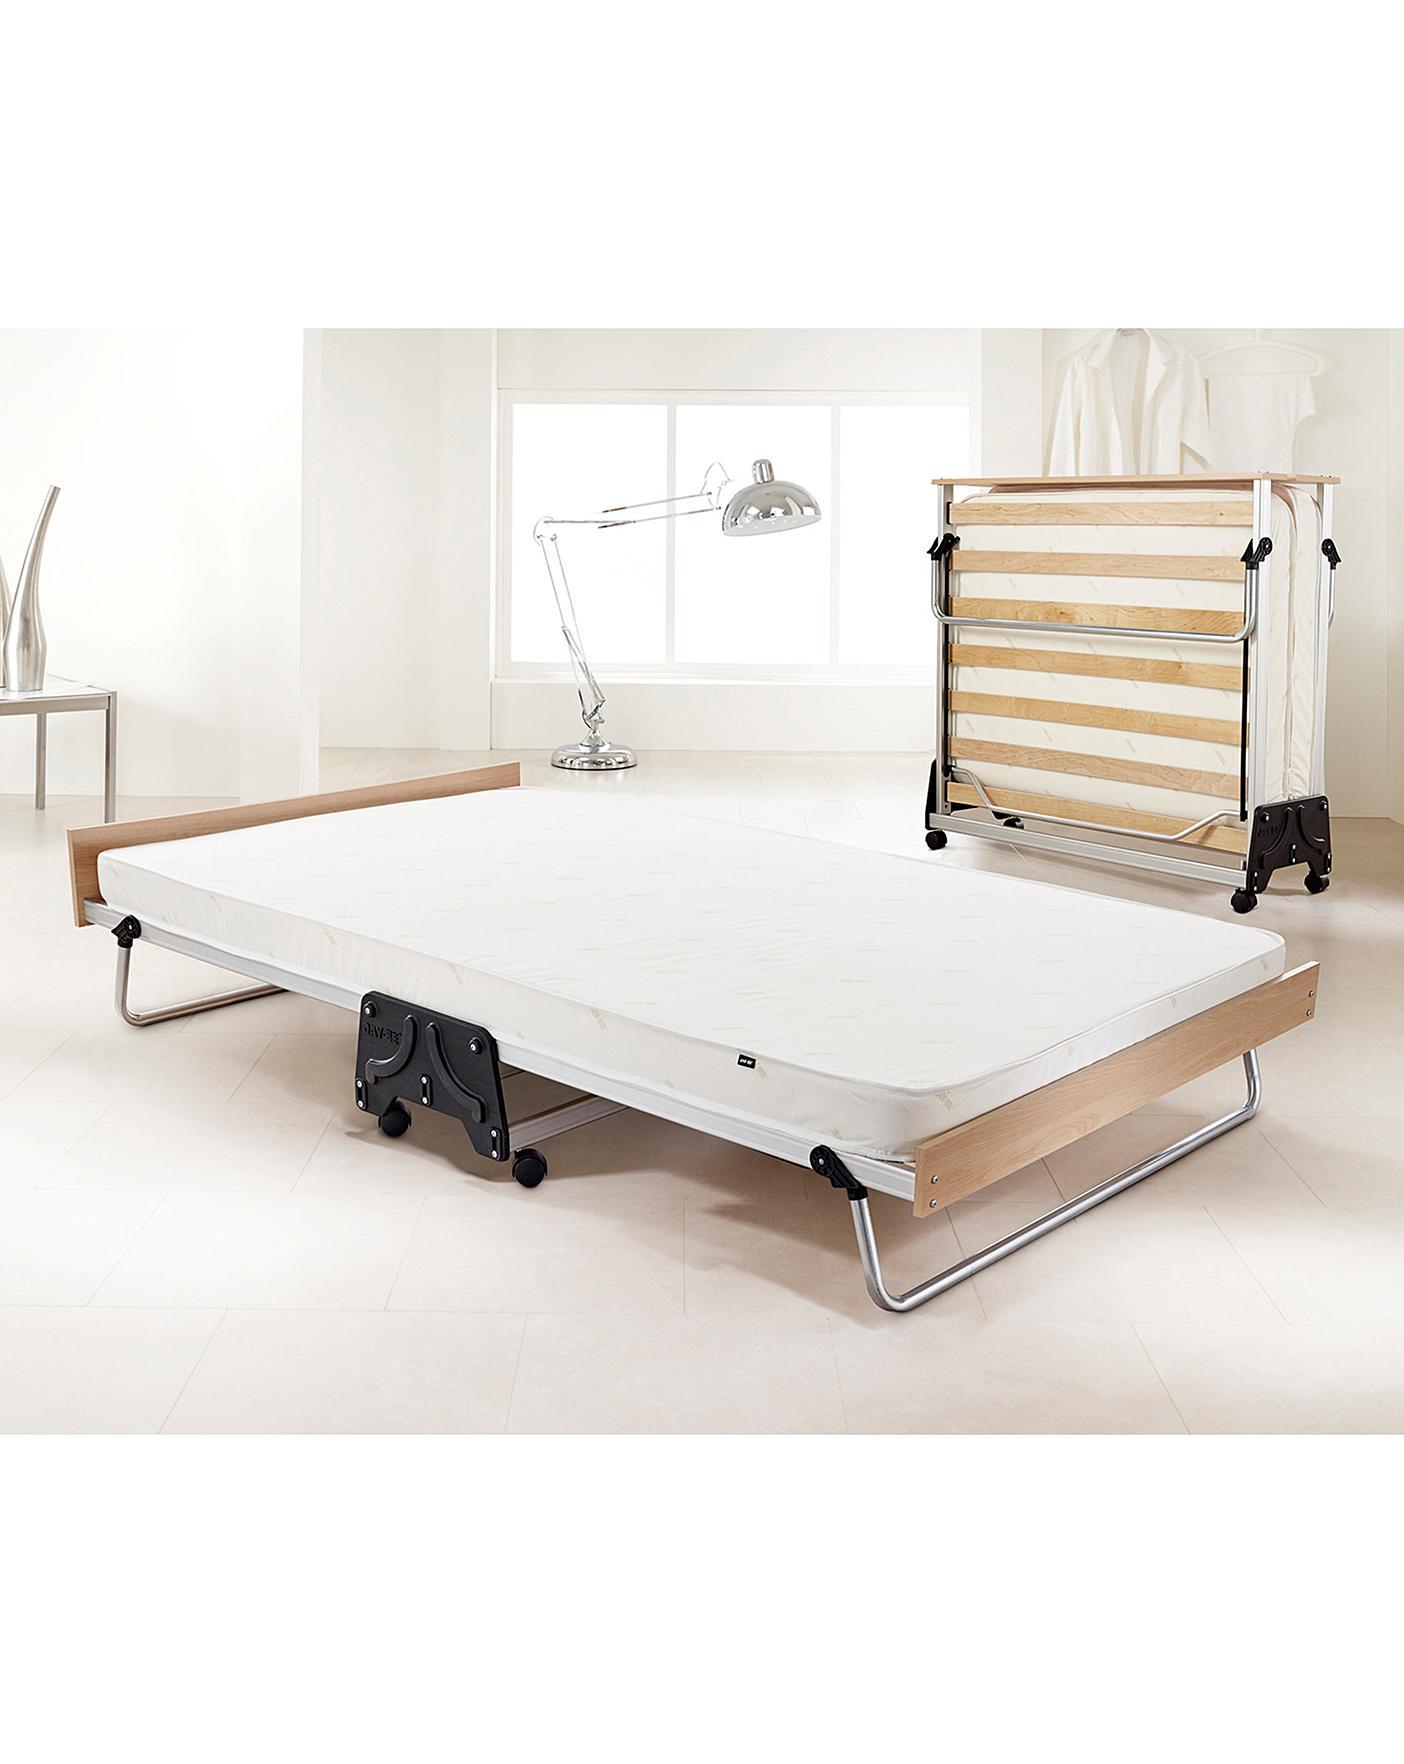 J Bed Double Fold Bed E Fibre Mattress J D Williams